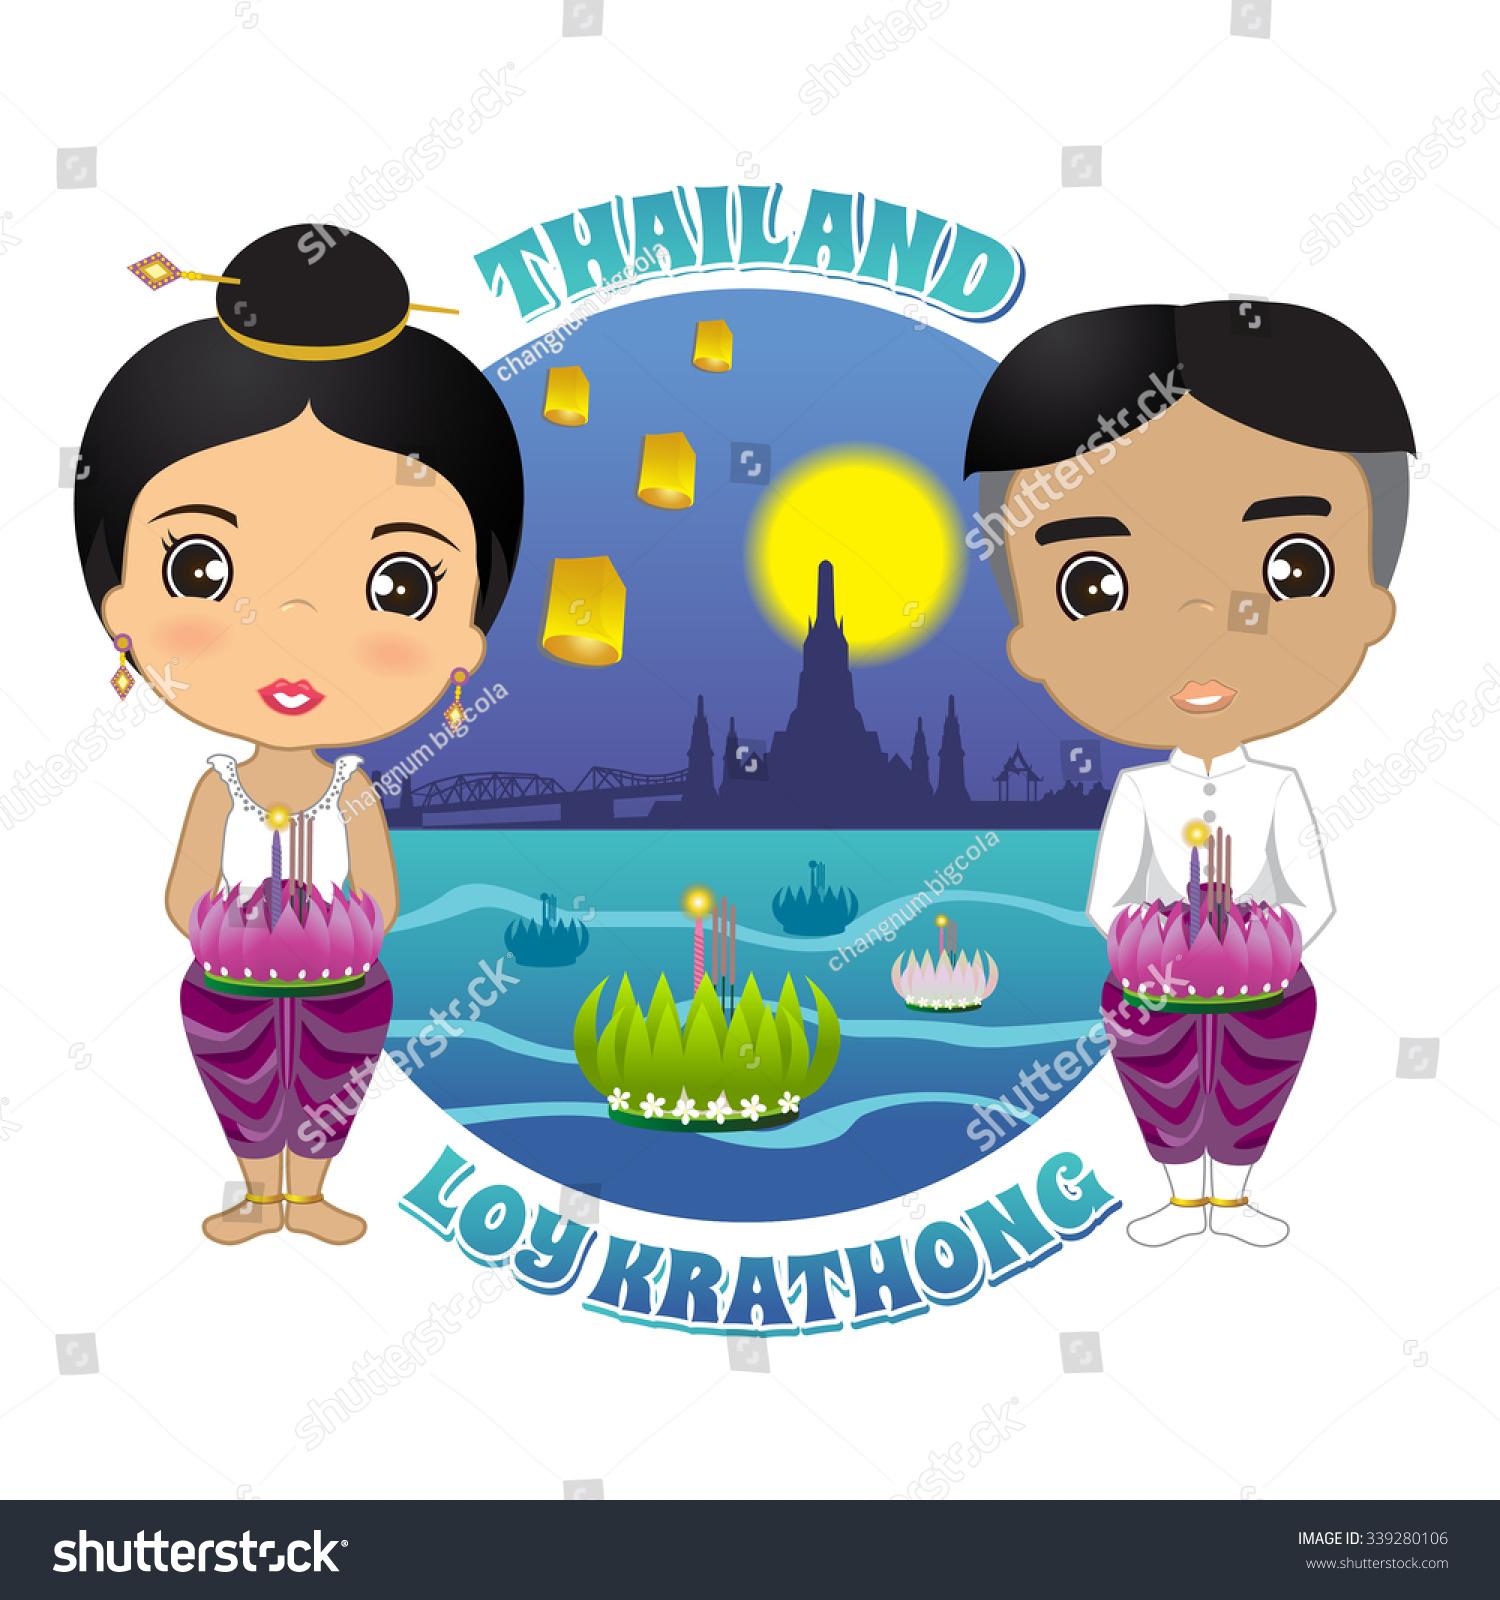 Krathong art photo